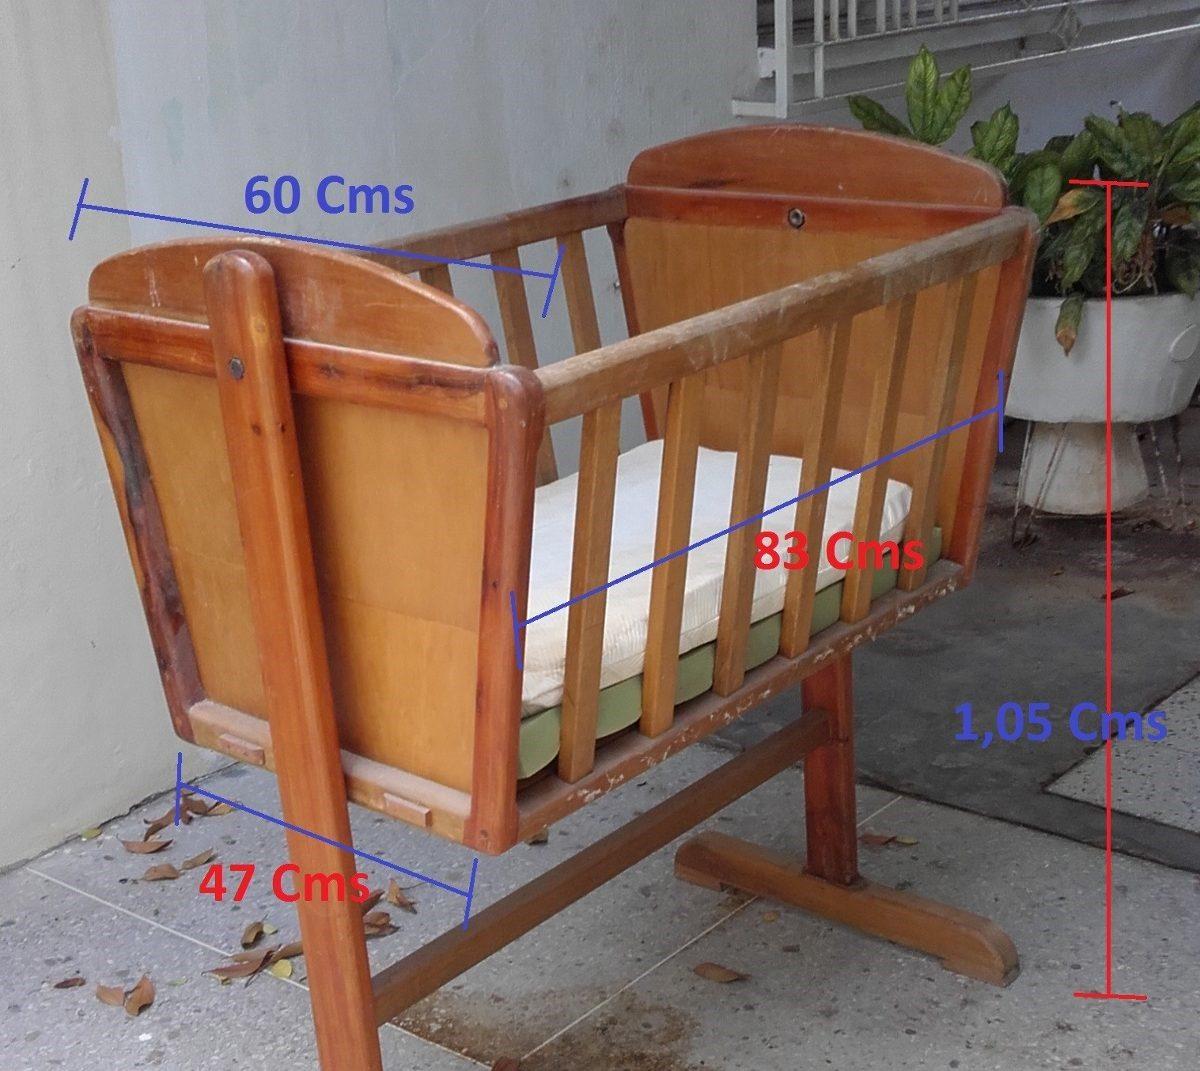 Cuna de madera para bebe sc proteger infancia seguridad for Cunas para bebes de madera